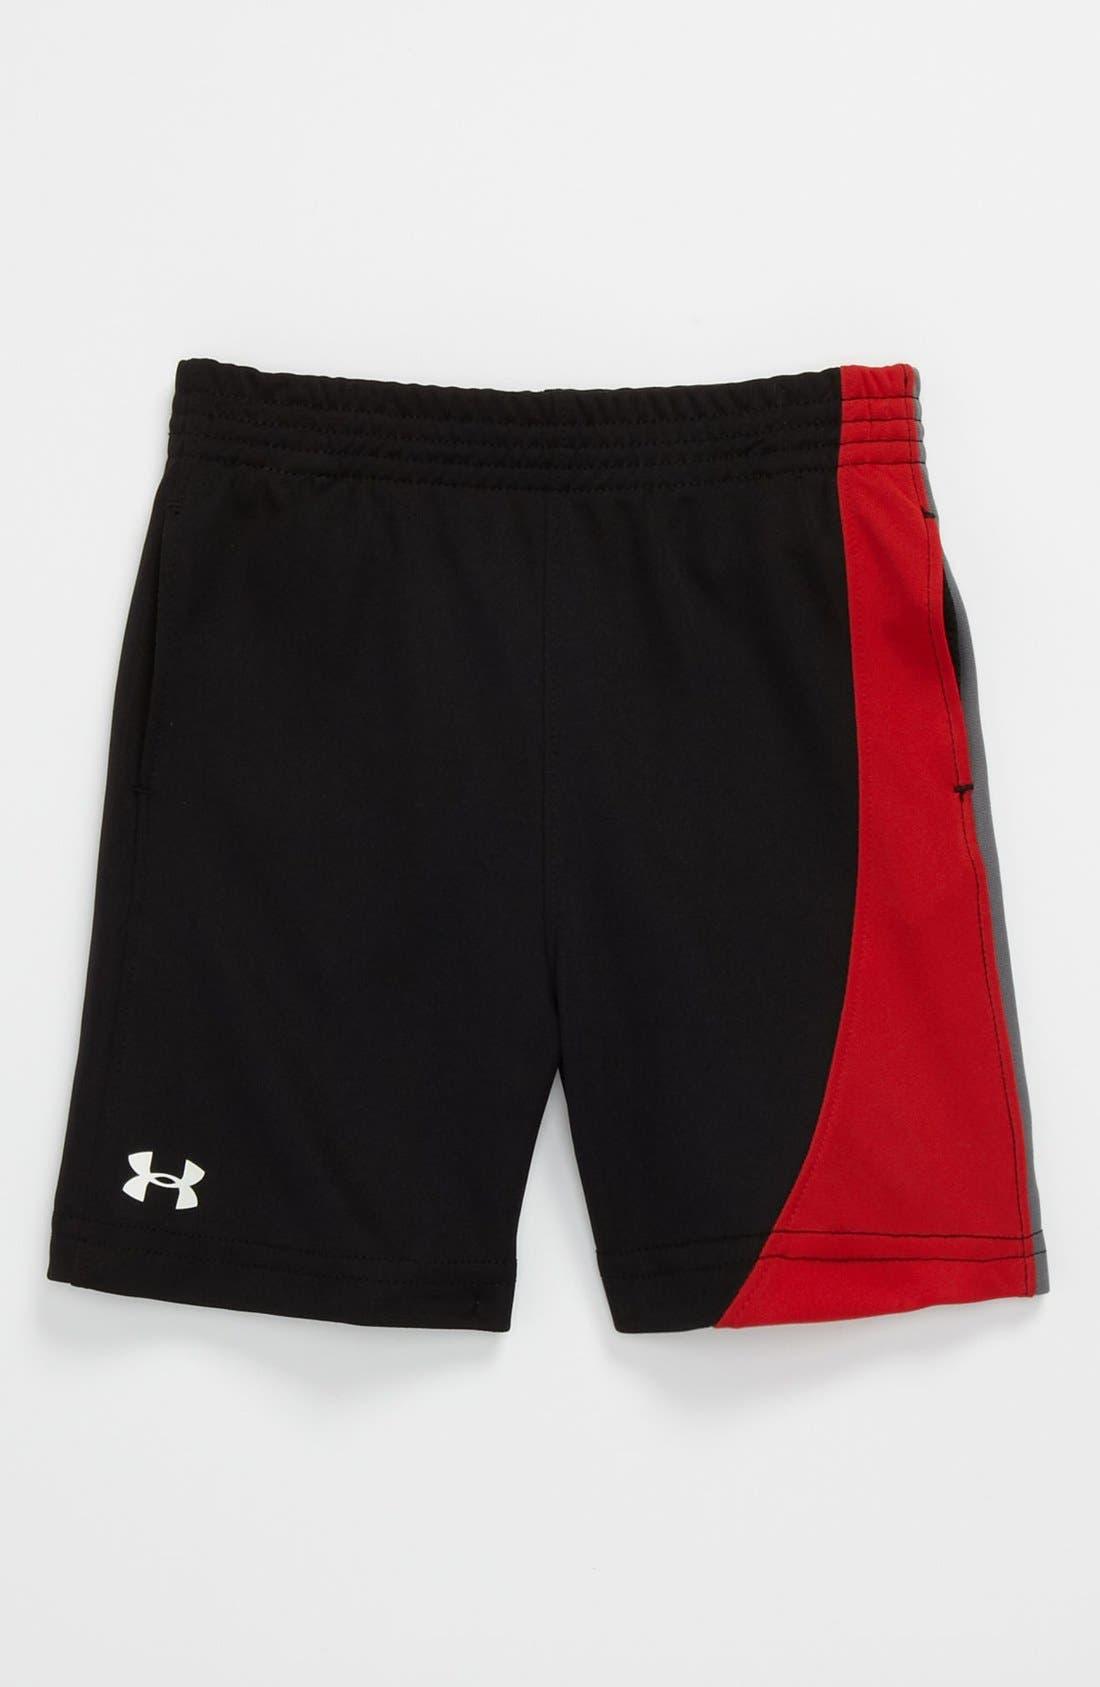 Main Image - Under Armour 'Flip' Shorts (Toddler)